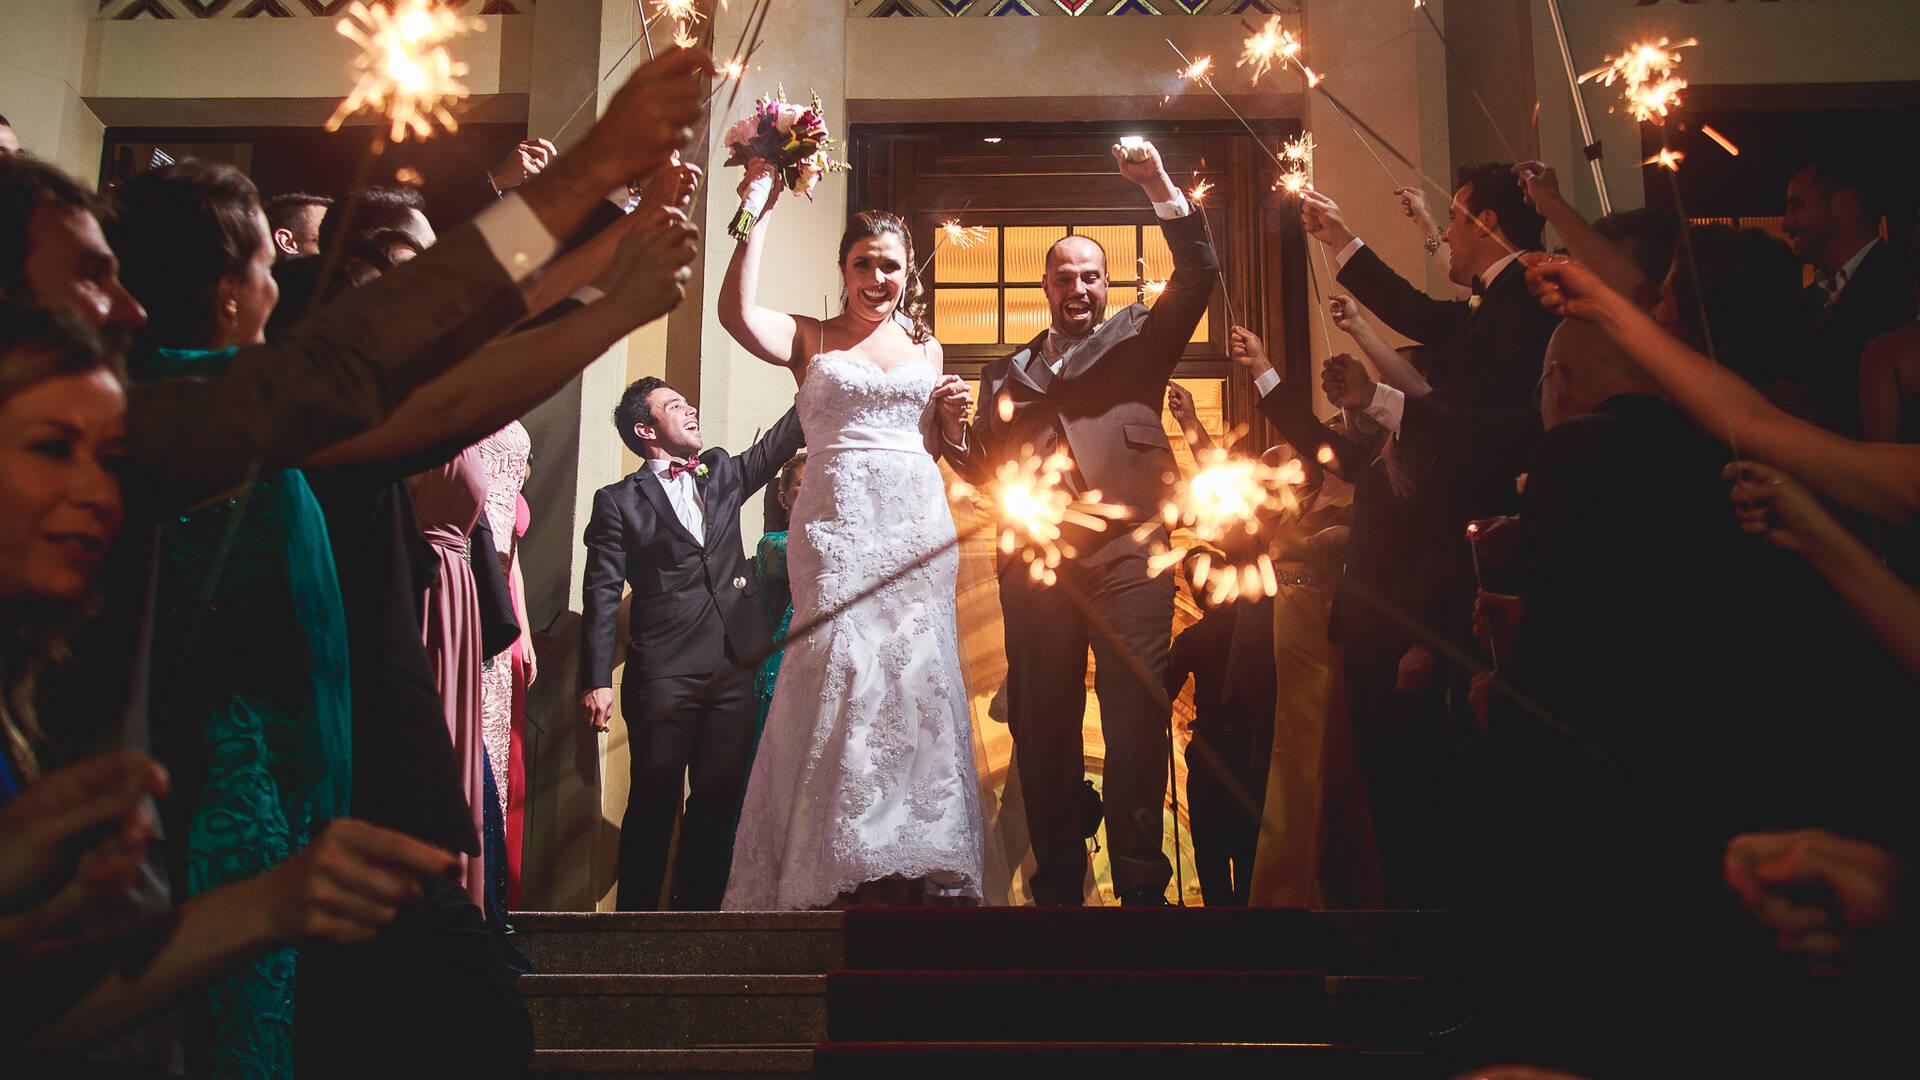 Casamento de Simone e Duda